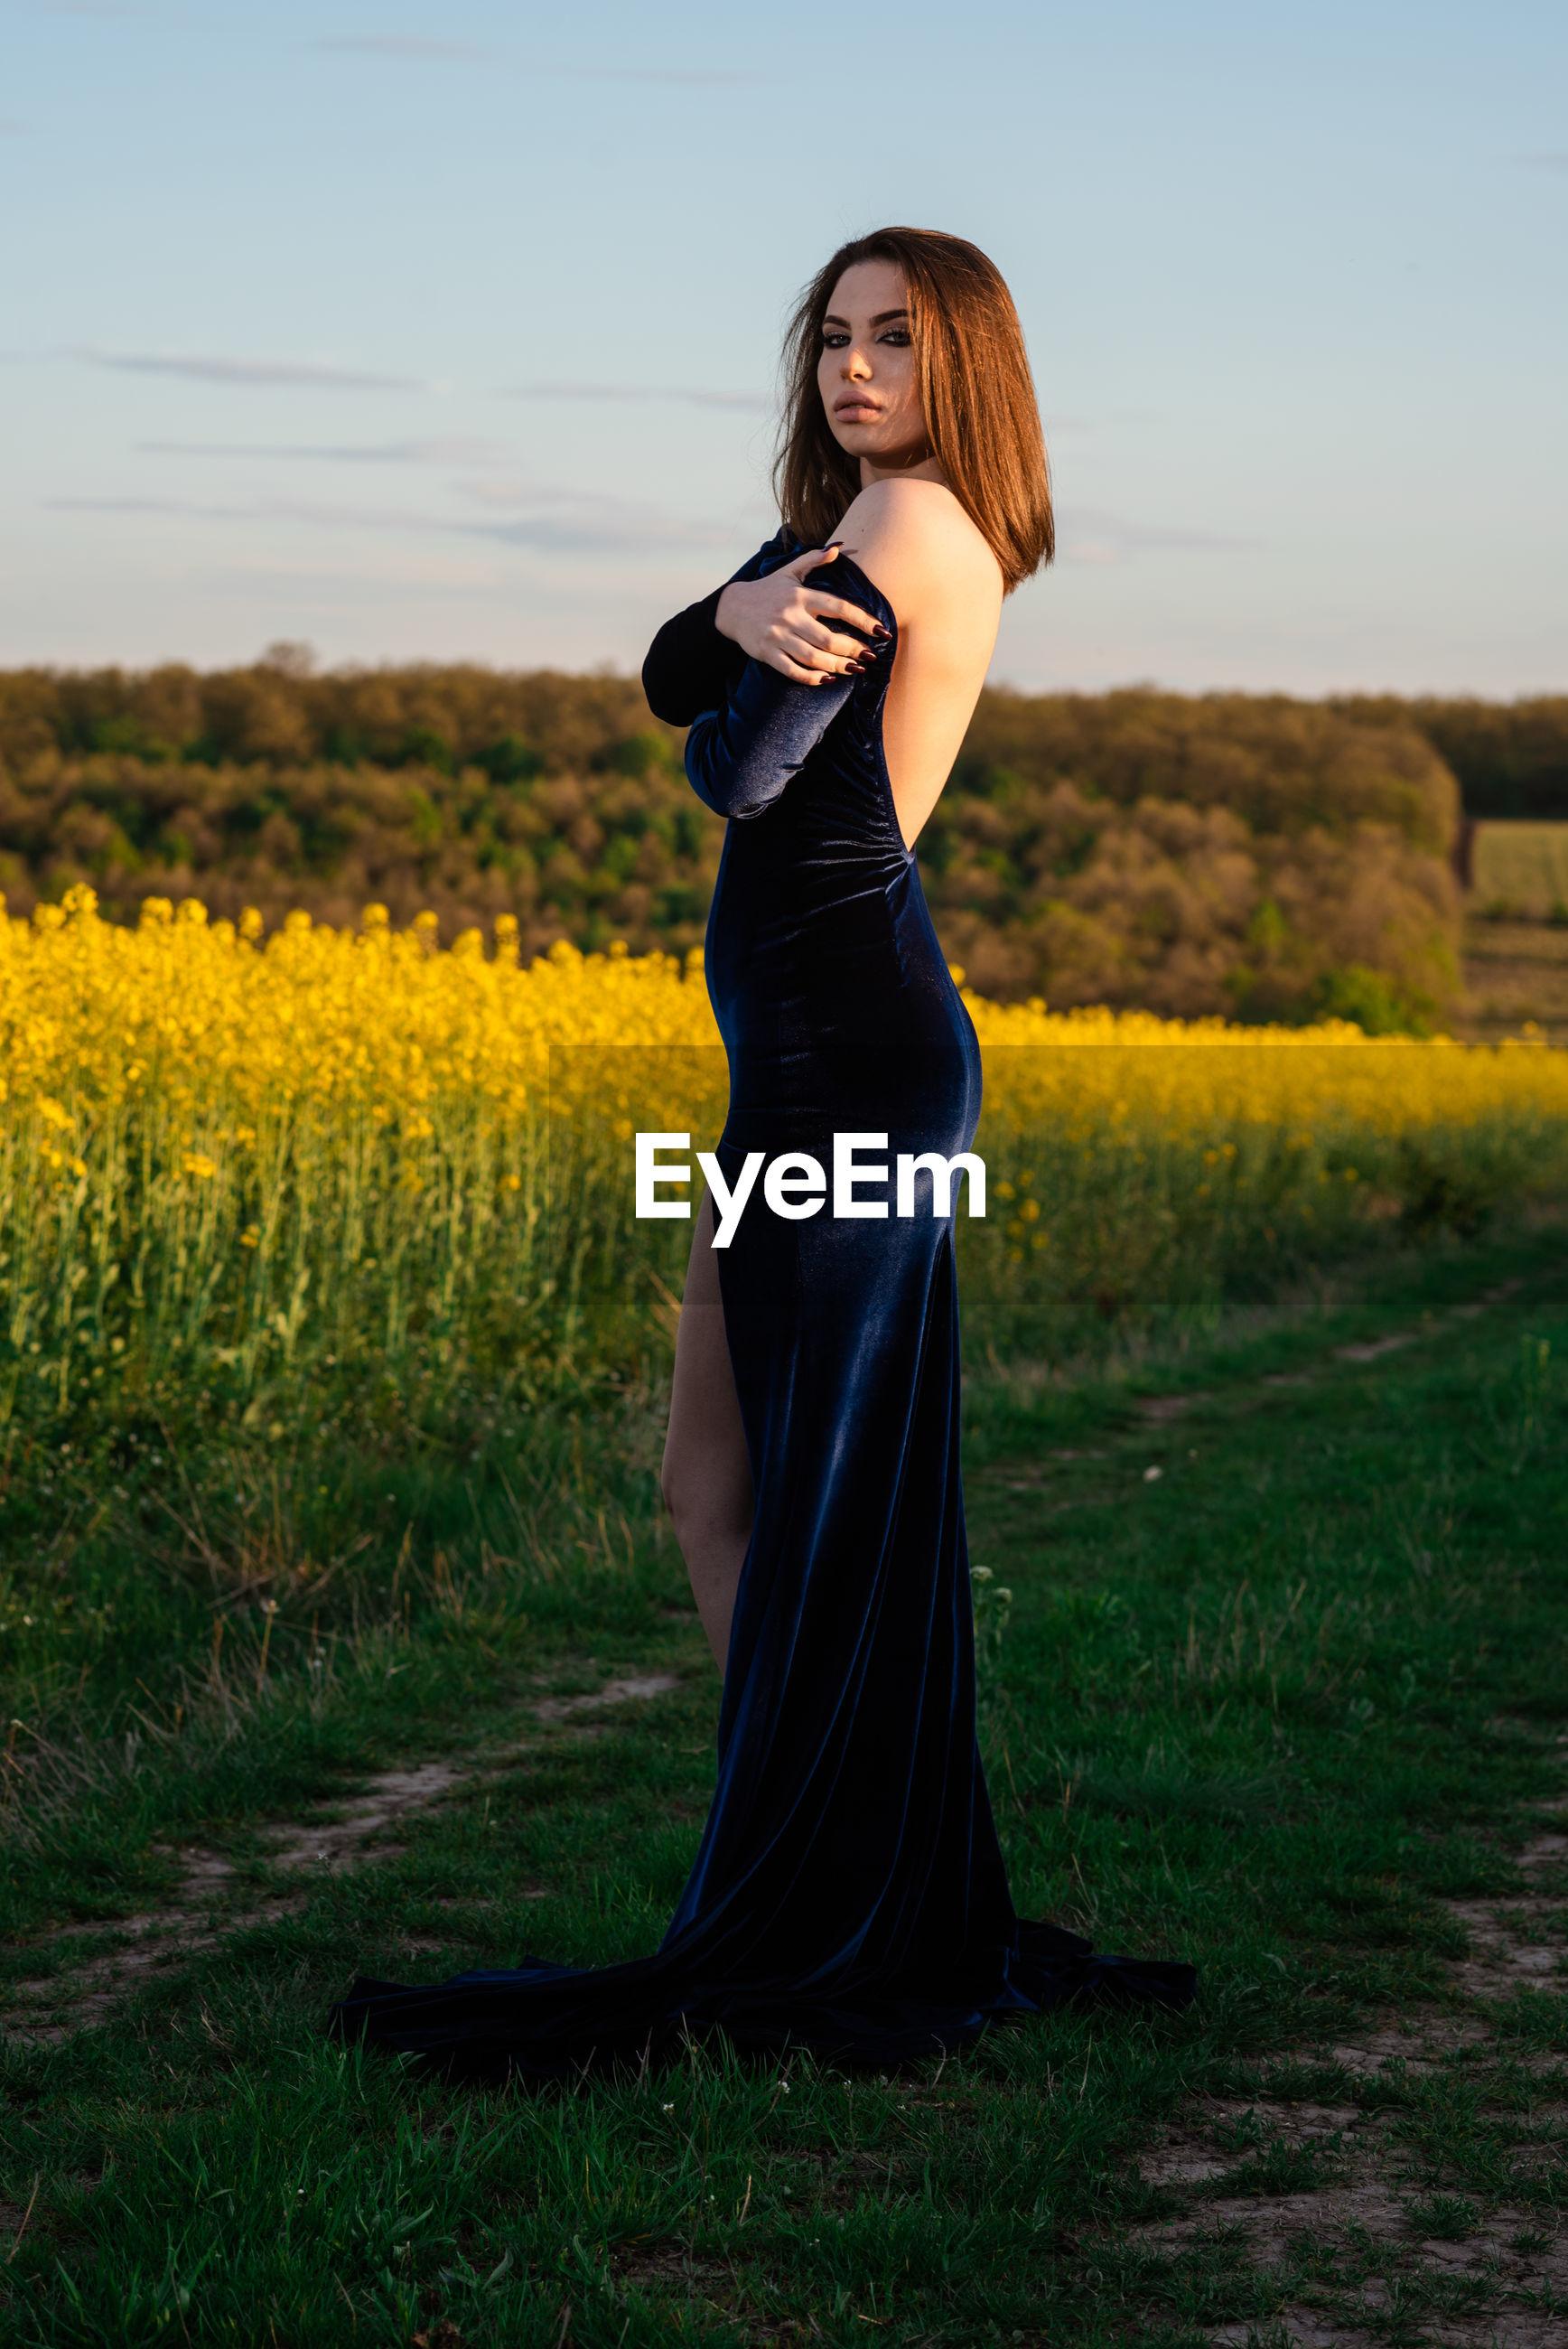 Full length portrait of woman standing on field